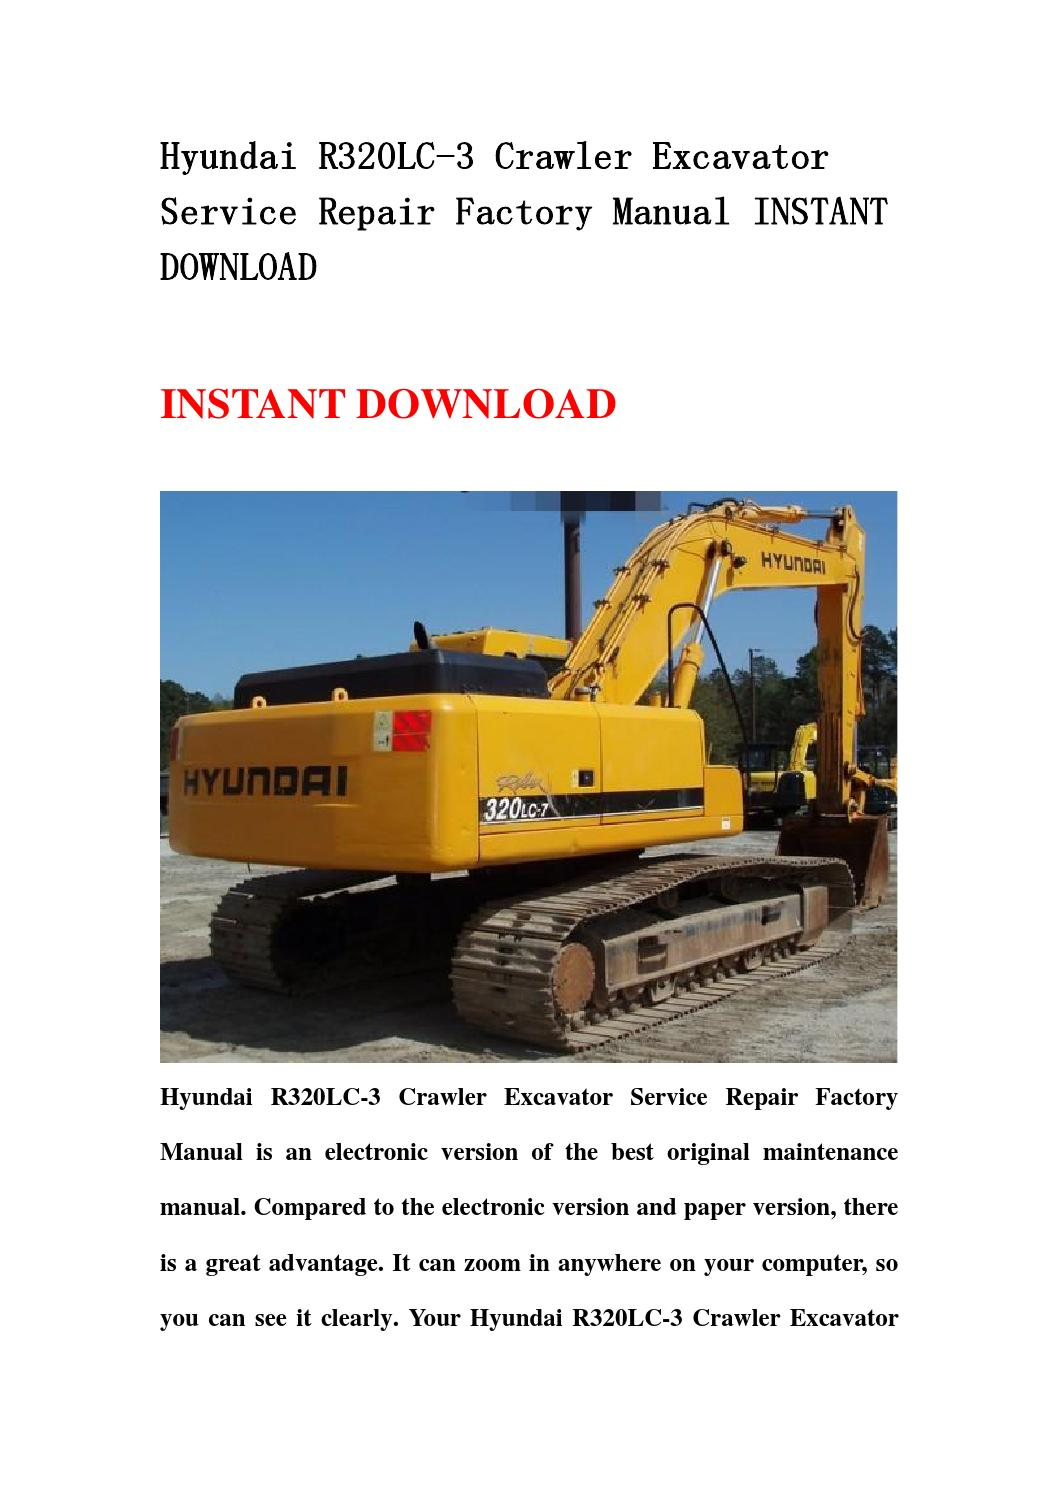 hyundai r320lc 3 crawler excavator service repair factory